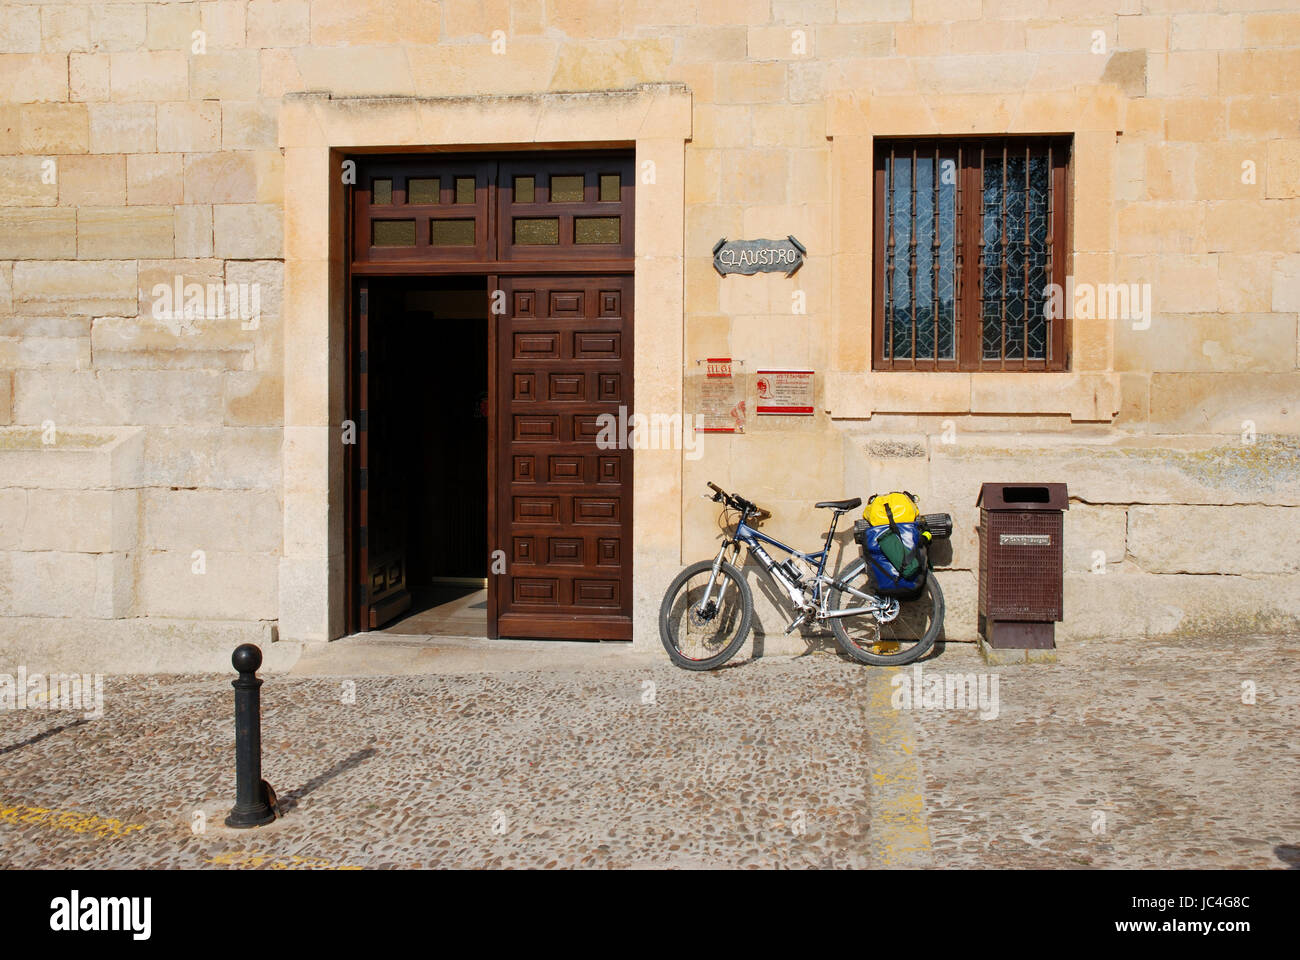 Entrance to monastery and pilgrim's bike. Santo Domingo de Silos, Burgos province, Castilla Leon, Spain. - Stock Image